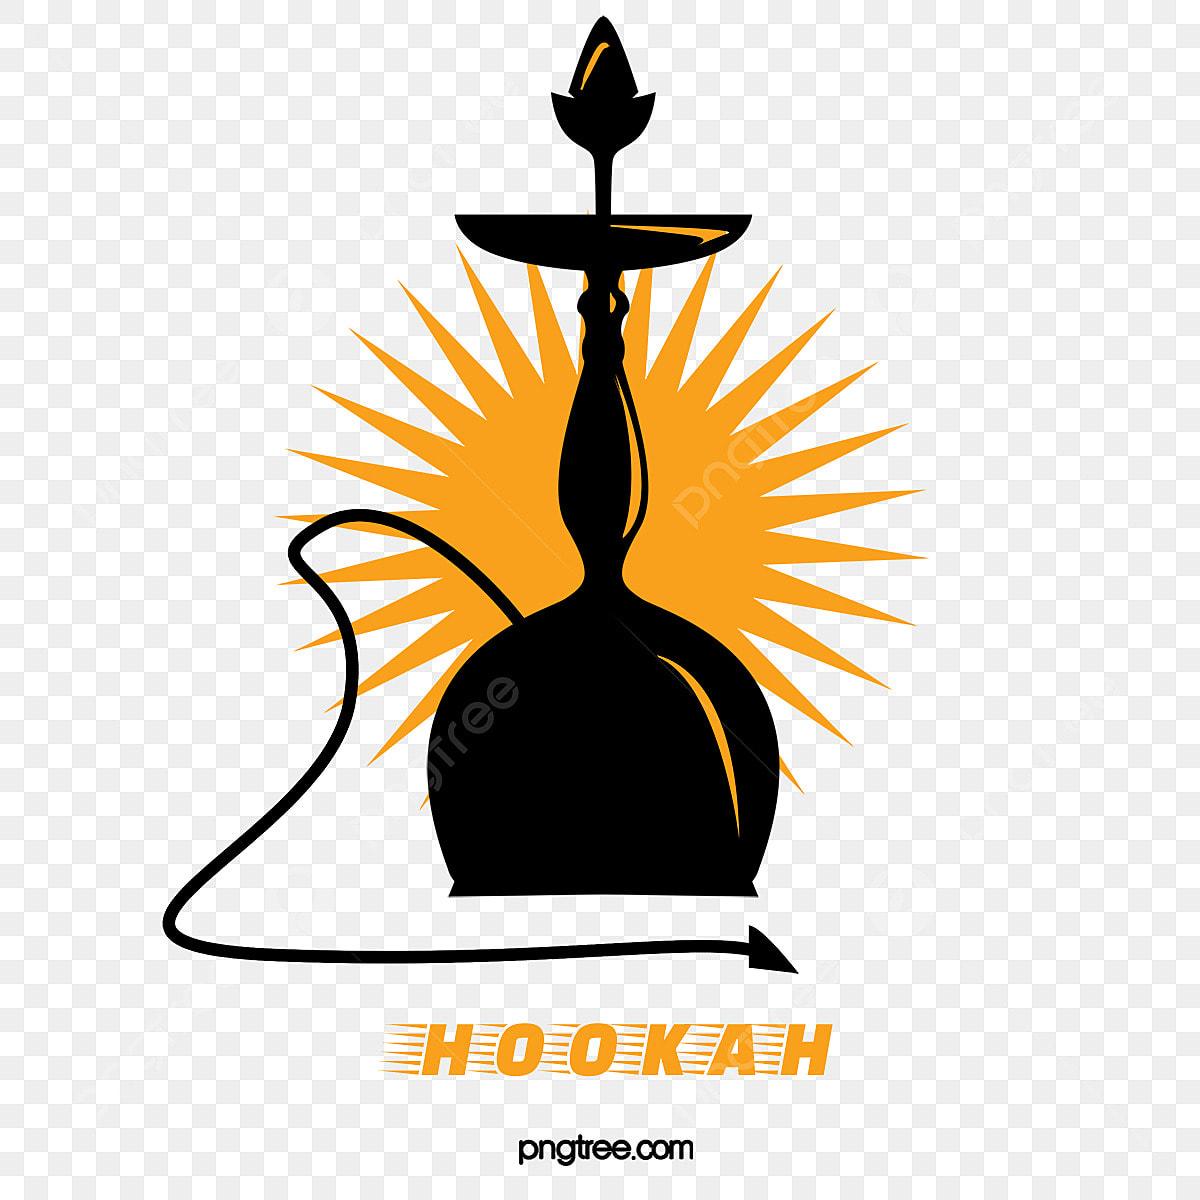 Hookah Cartoon Hookah Authors Png Transparent Clipart Image And